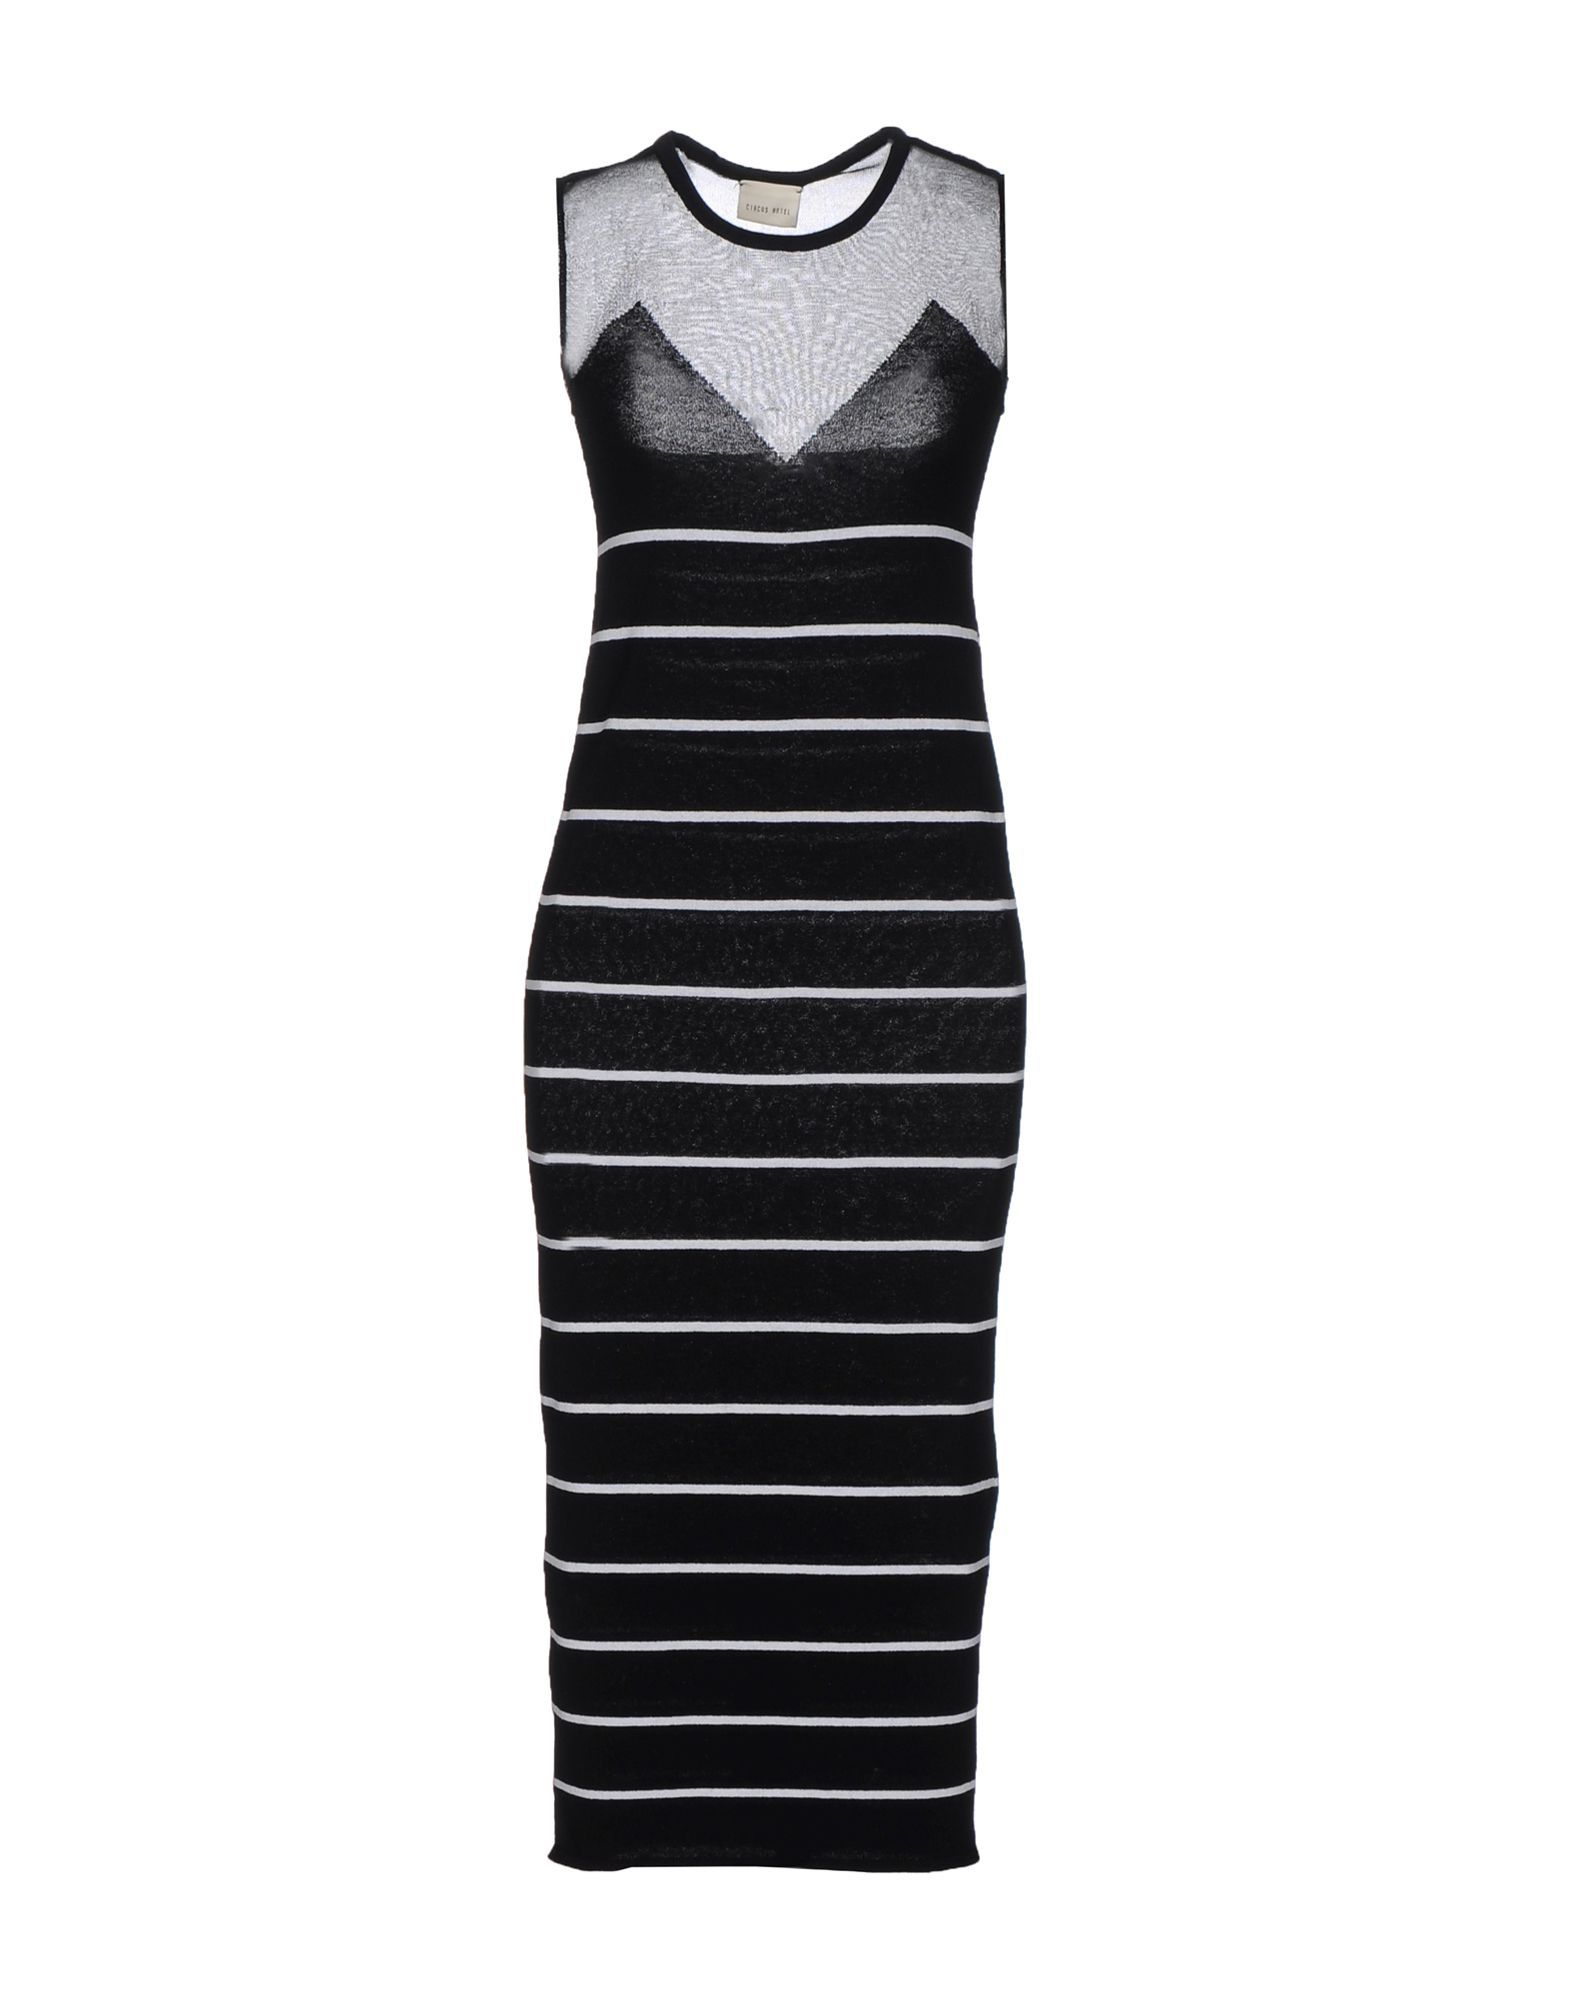 DRESSES - Knee-length dresses Circus Hotel y3mIrtg9sm